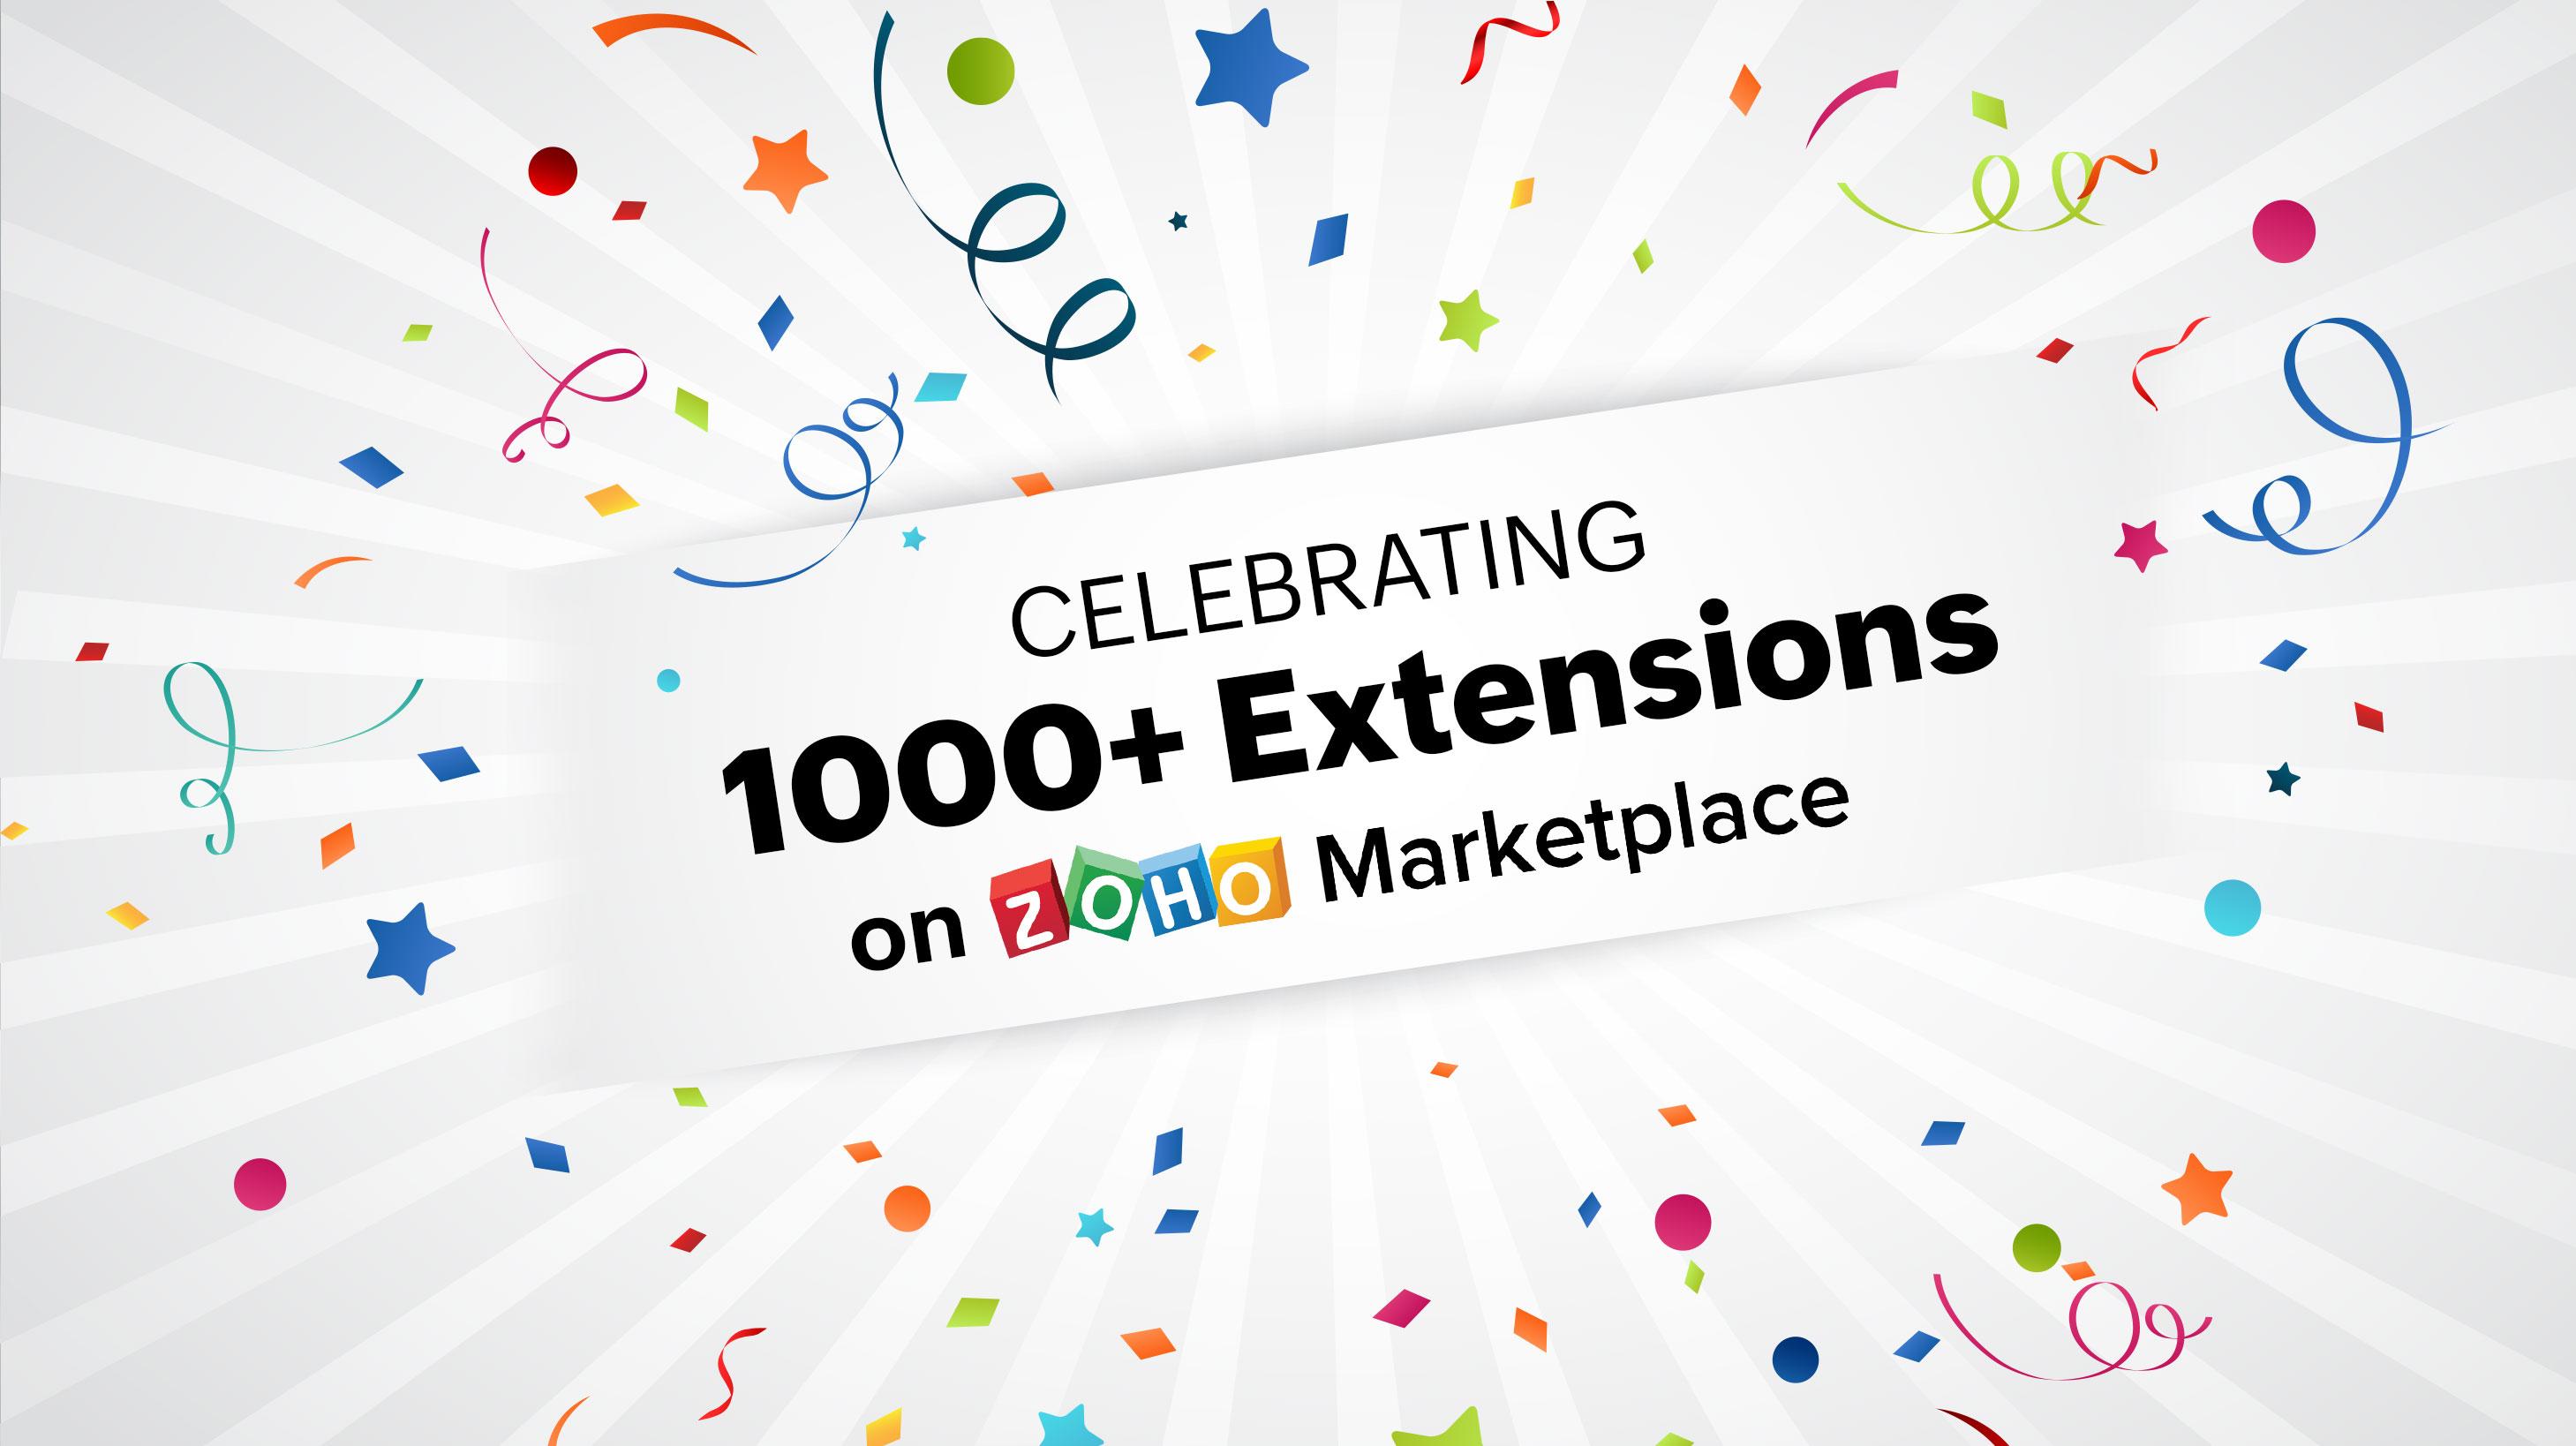 Celebrating 1000+ extensions on Zoho Marketplace